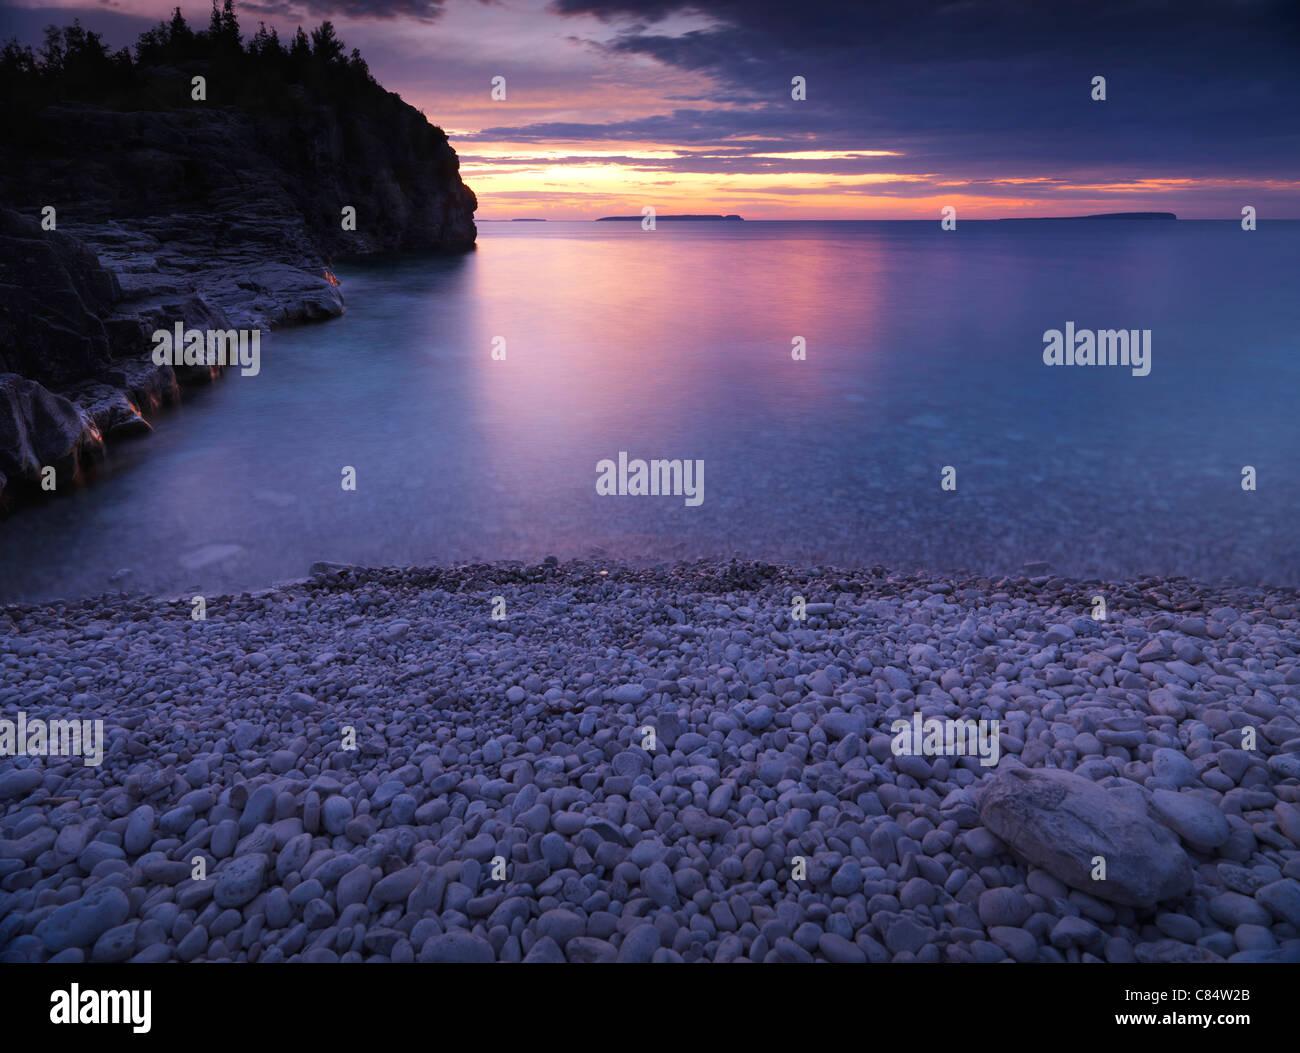 Beautiful sunset scenery of Georgian Bay rocky shore. Bruce Peninsula National Park, Ontario, Canada. - Stock Image